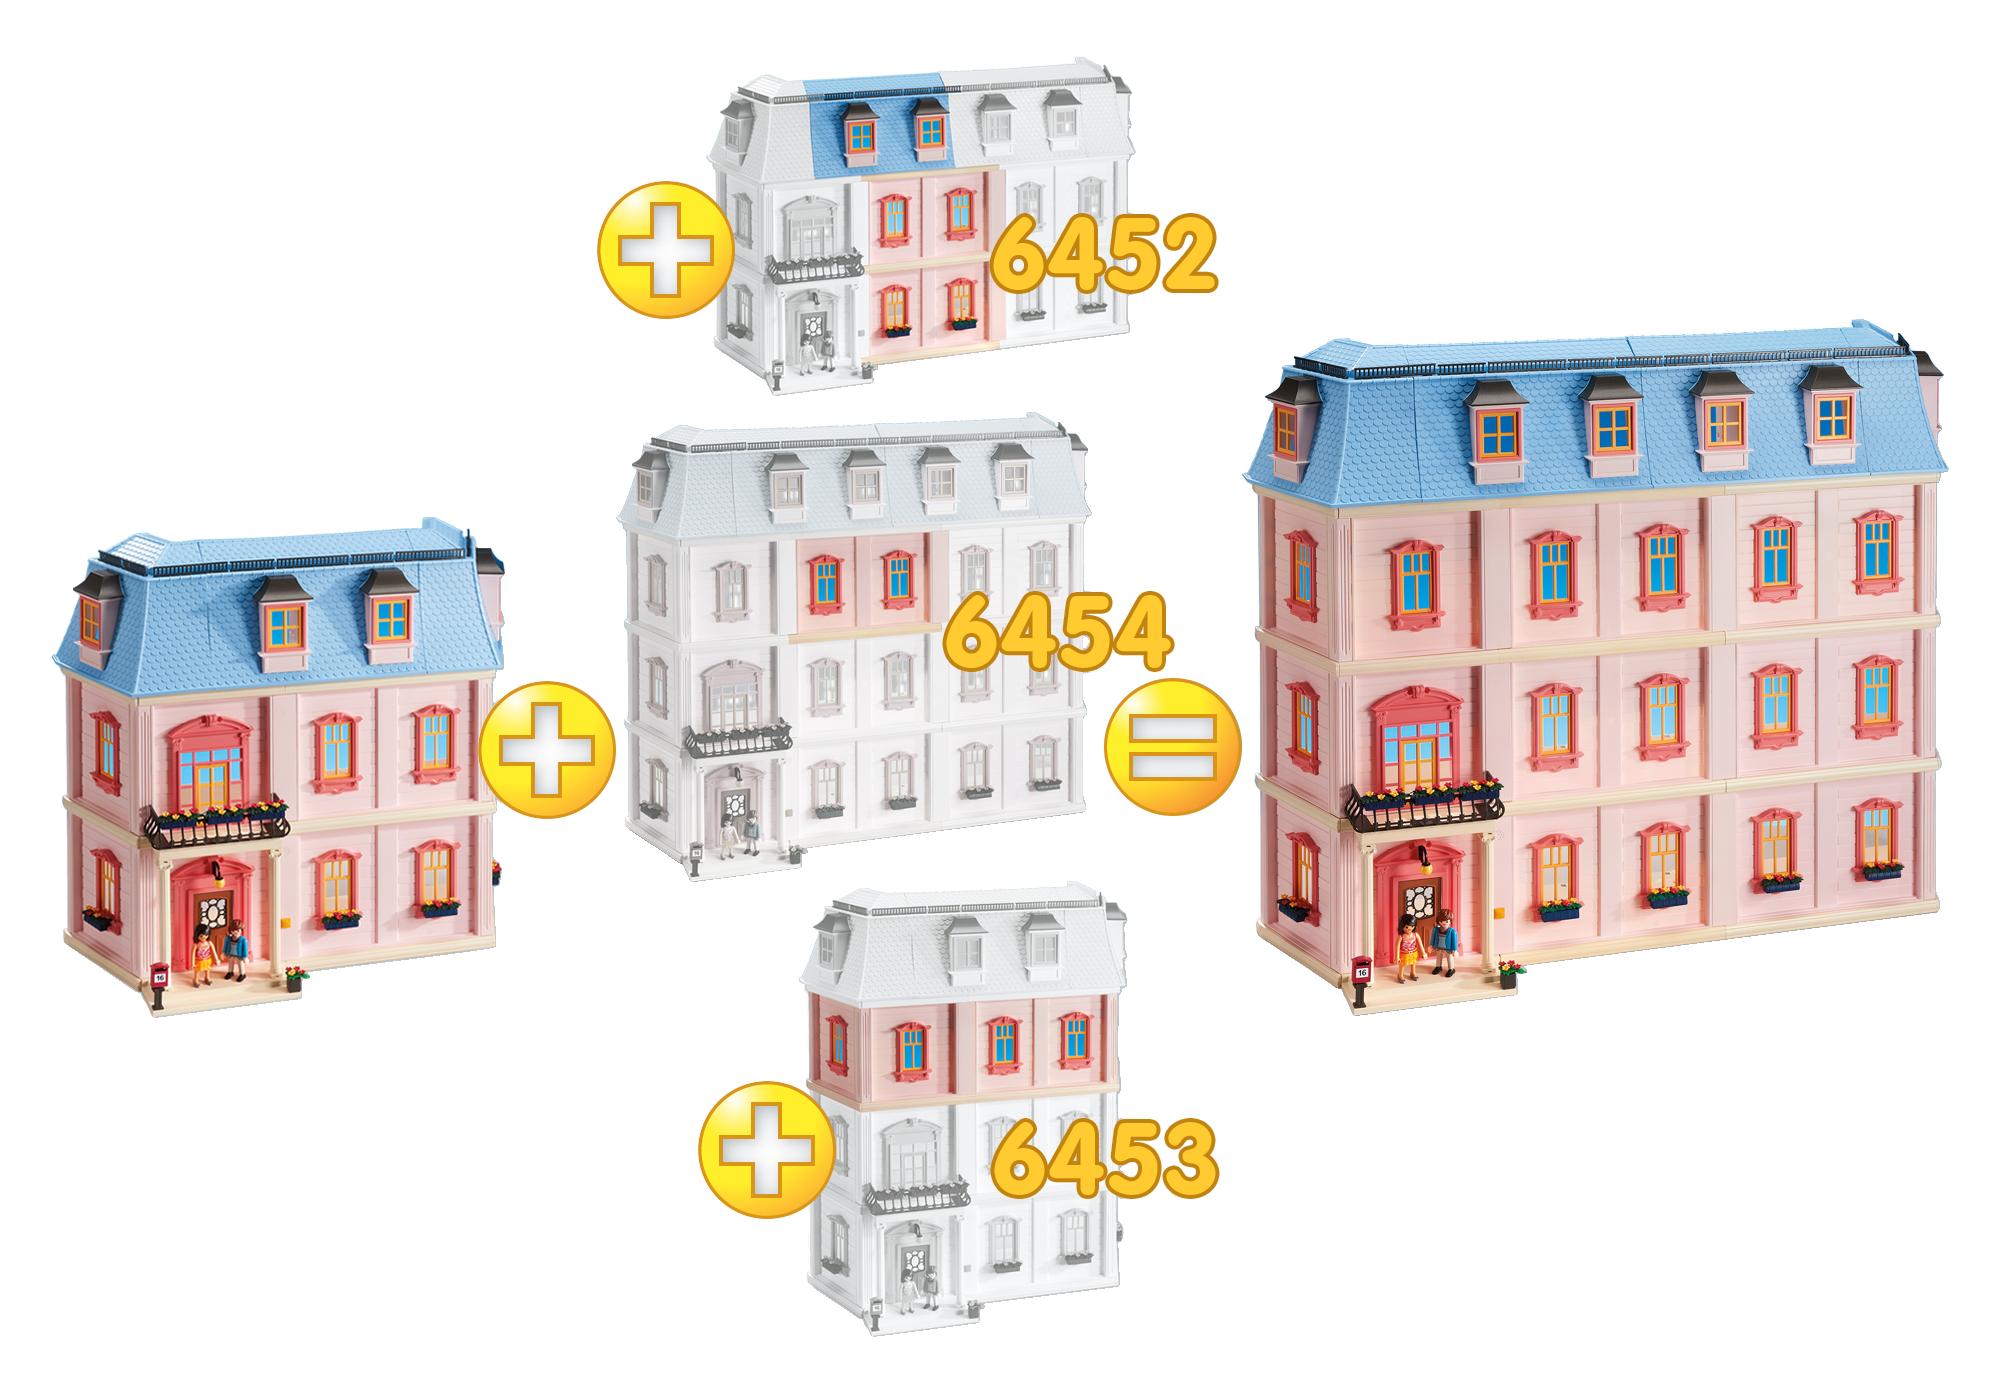 http://media.playmobil.com/i/playmobil/6454_product_extra1/Casa delle bambole estensione C